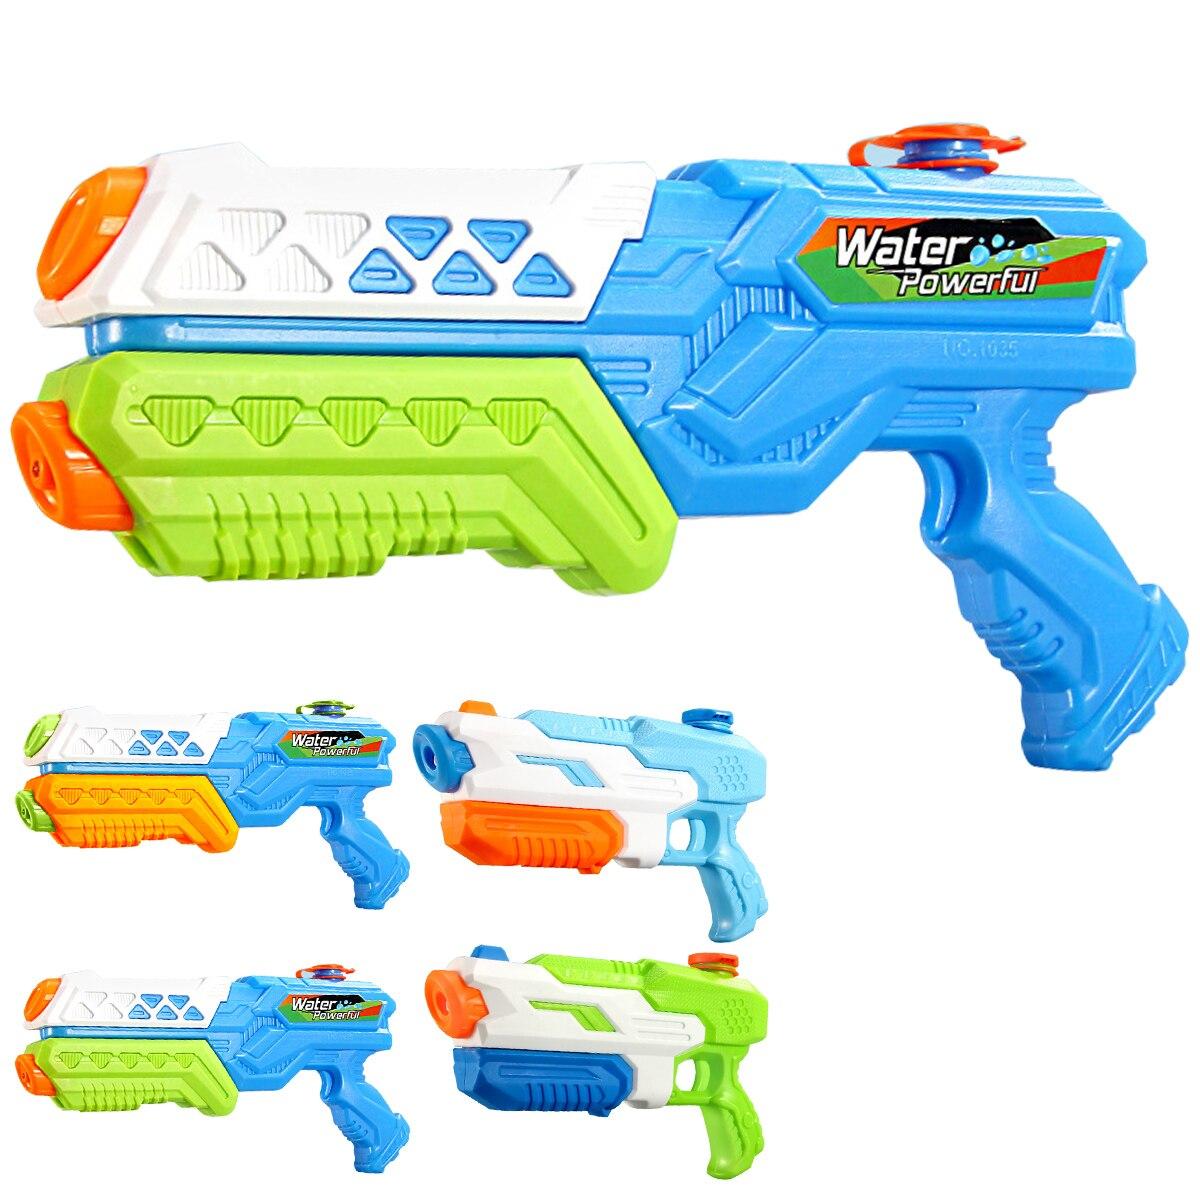 Water Gun Super Blasters Soaker Long Range Squirt Gun Toys High Capacity Summer Water Fight And Family Fun Toys